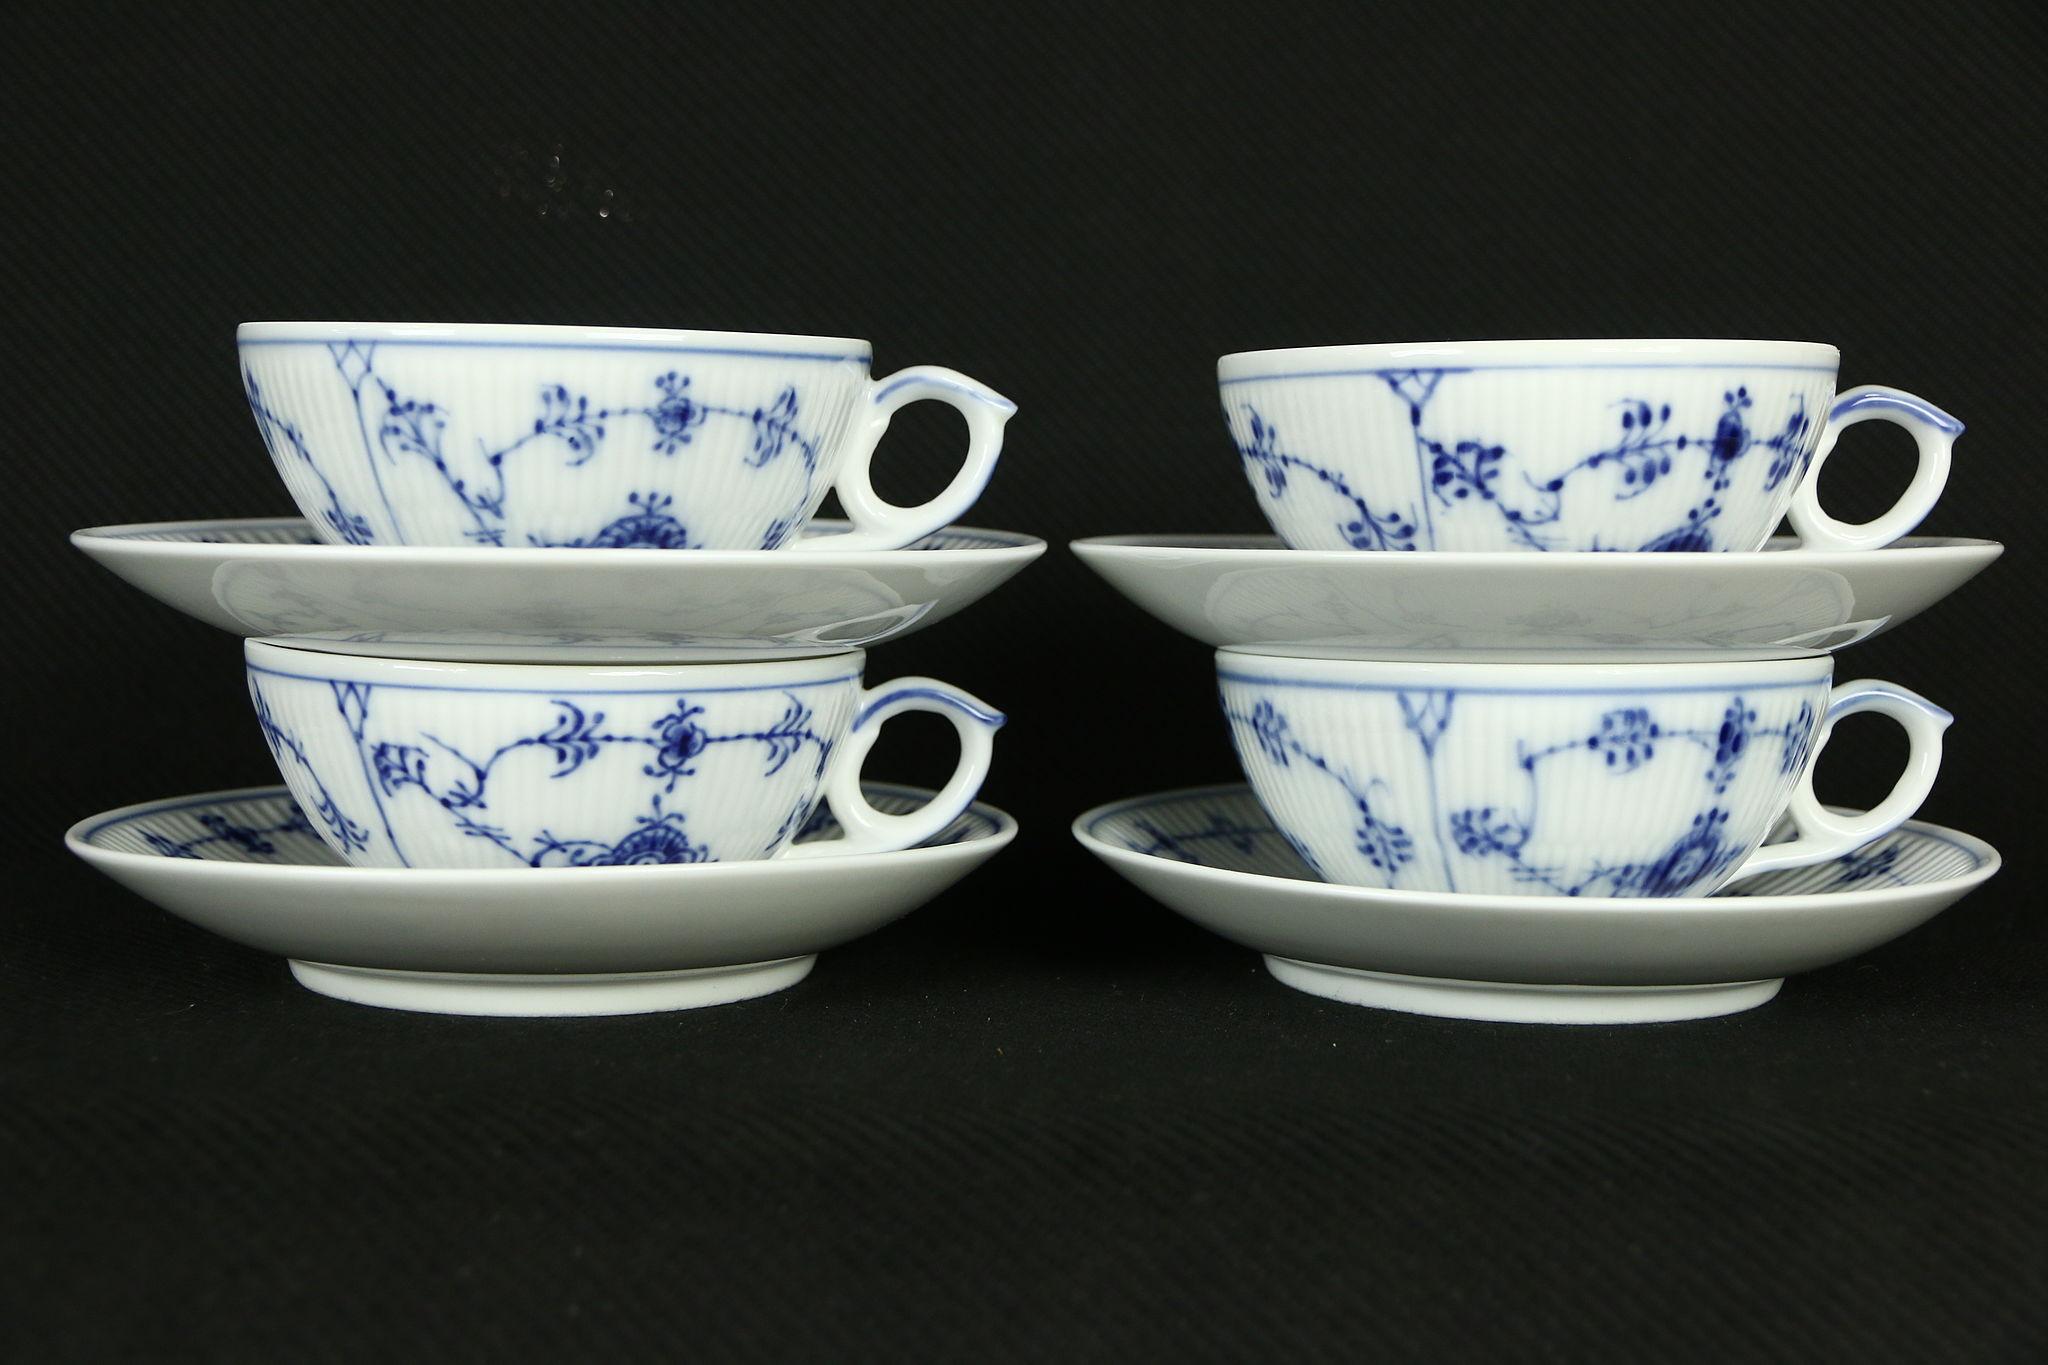 Royal Copenhagen Blue Fluted Set of 4 Cups \u0026 Saucers & SOLD - Royal Copenhagen Blue Fluted Set of 4 Cups \u0026 Saucers - Harp ...